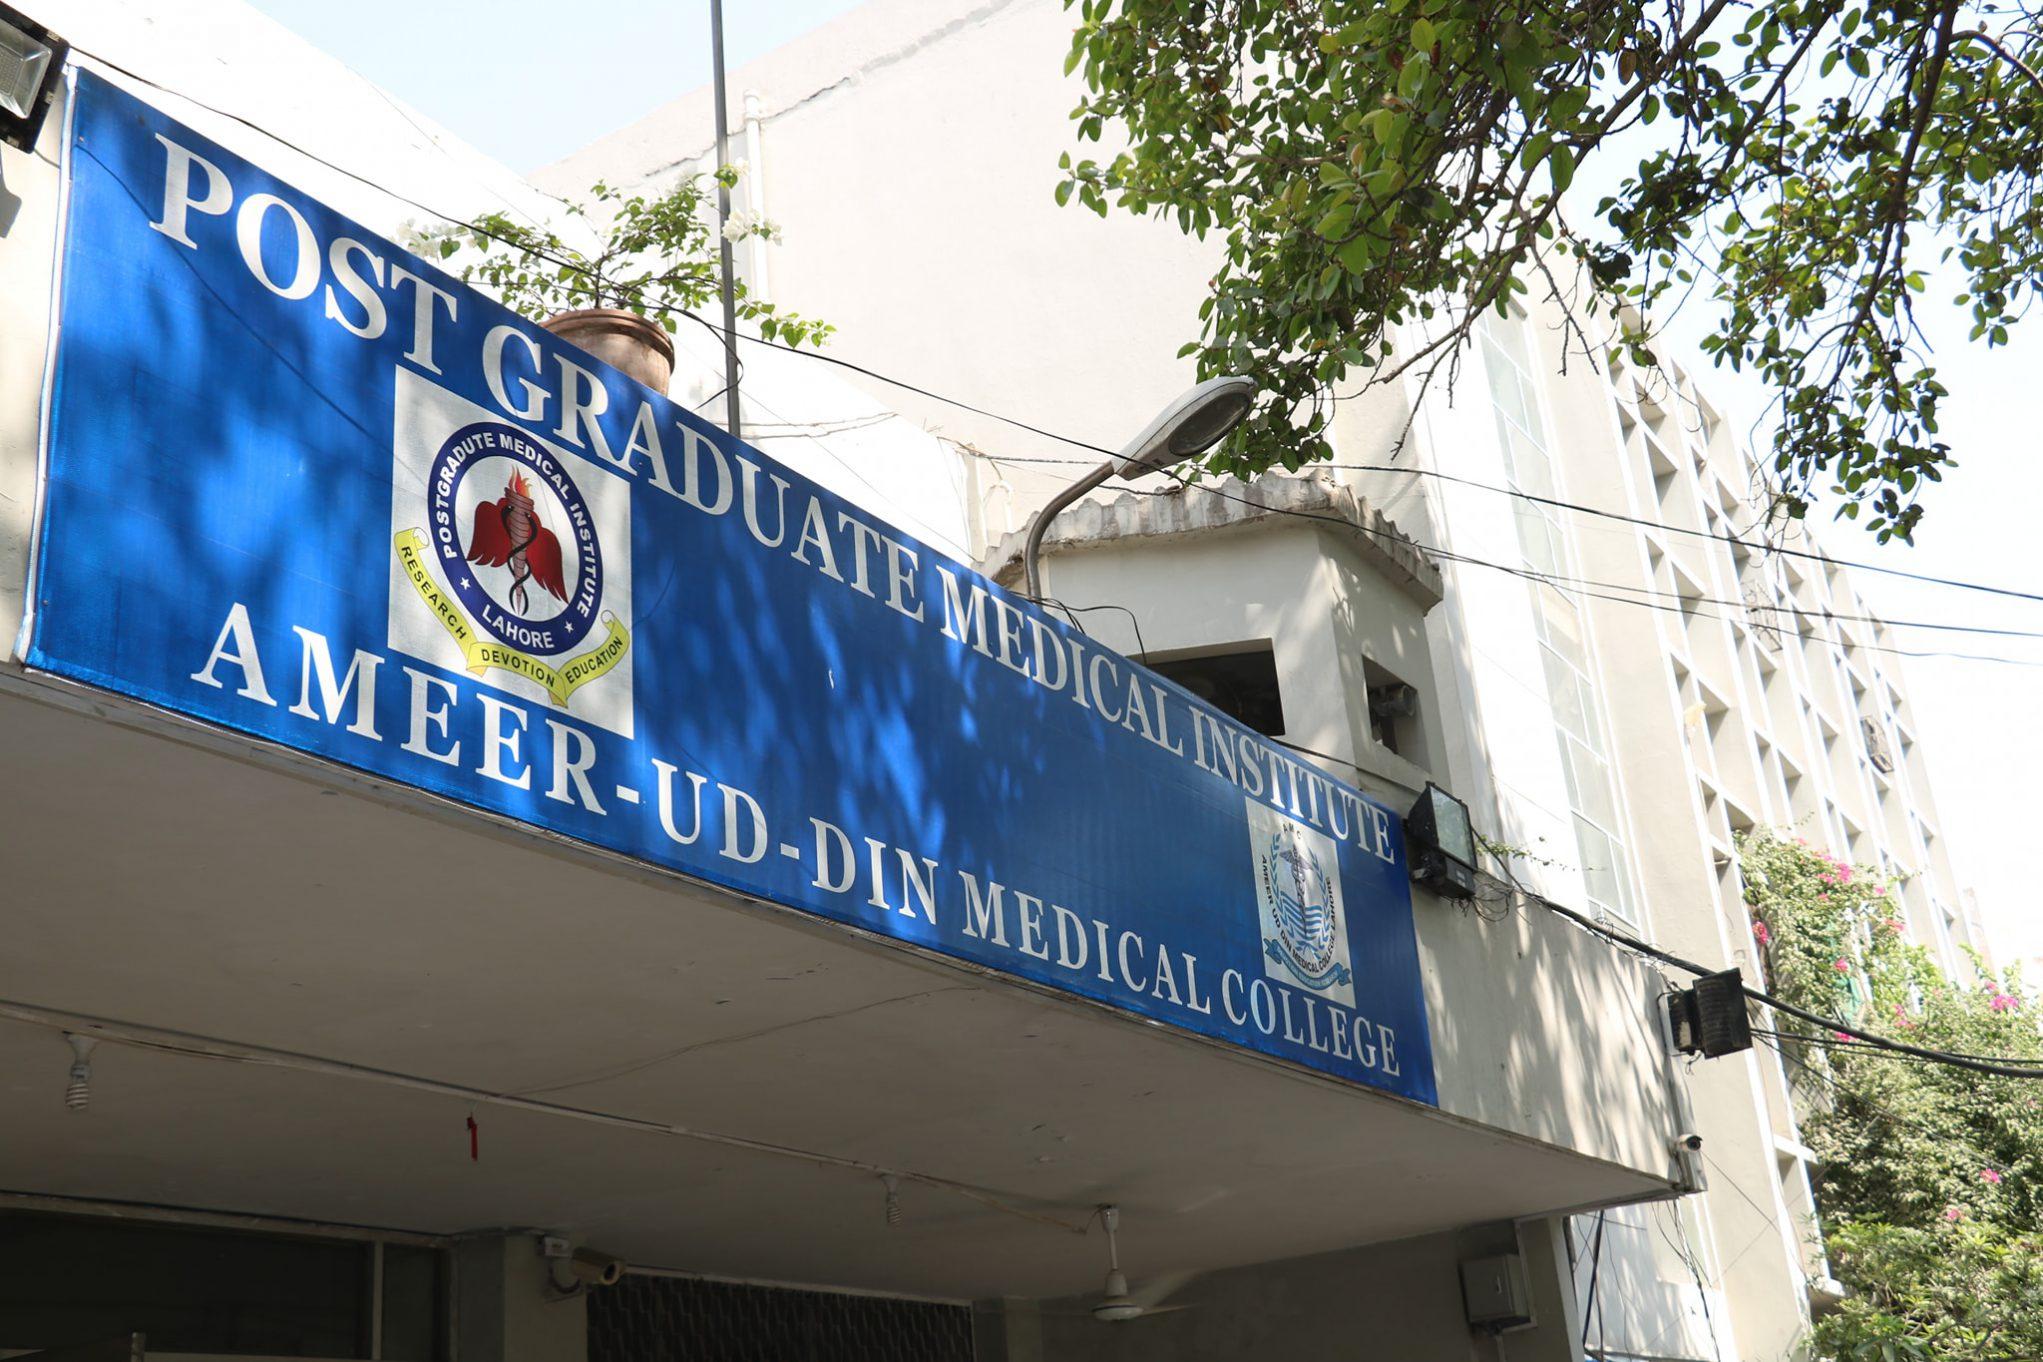 Ameer-ud-Din Medical College (PGMI)